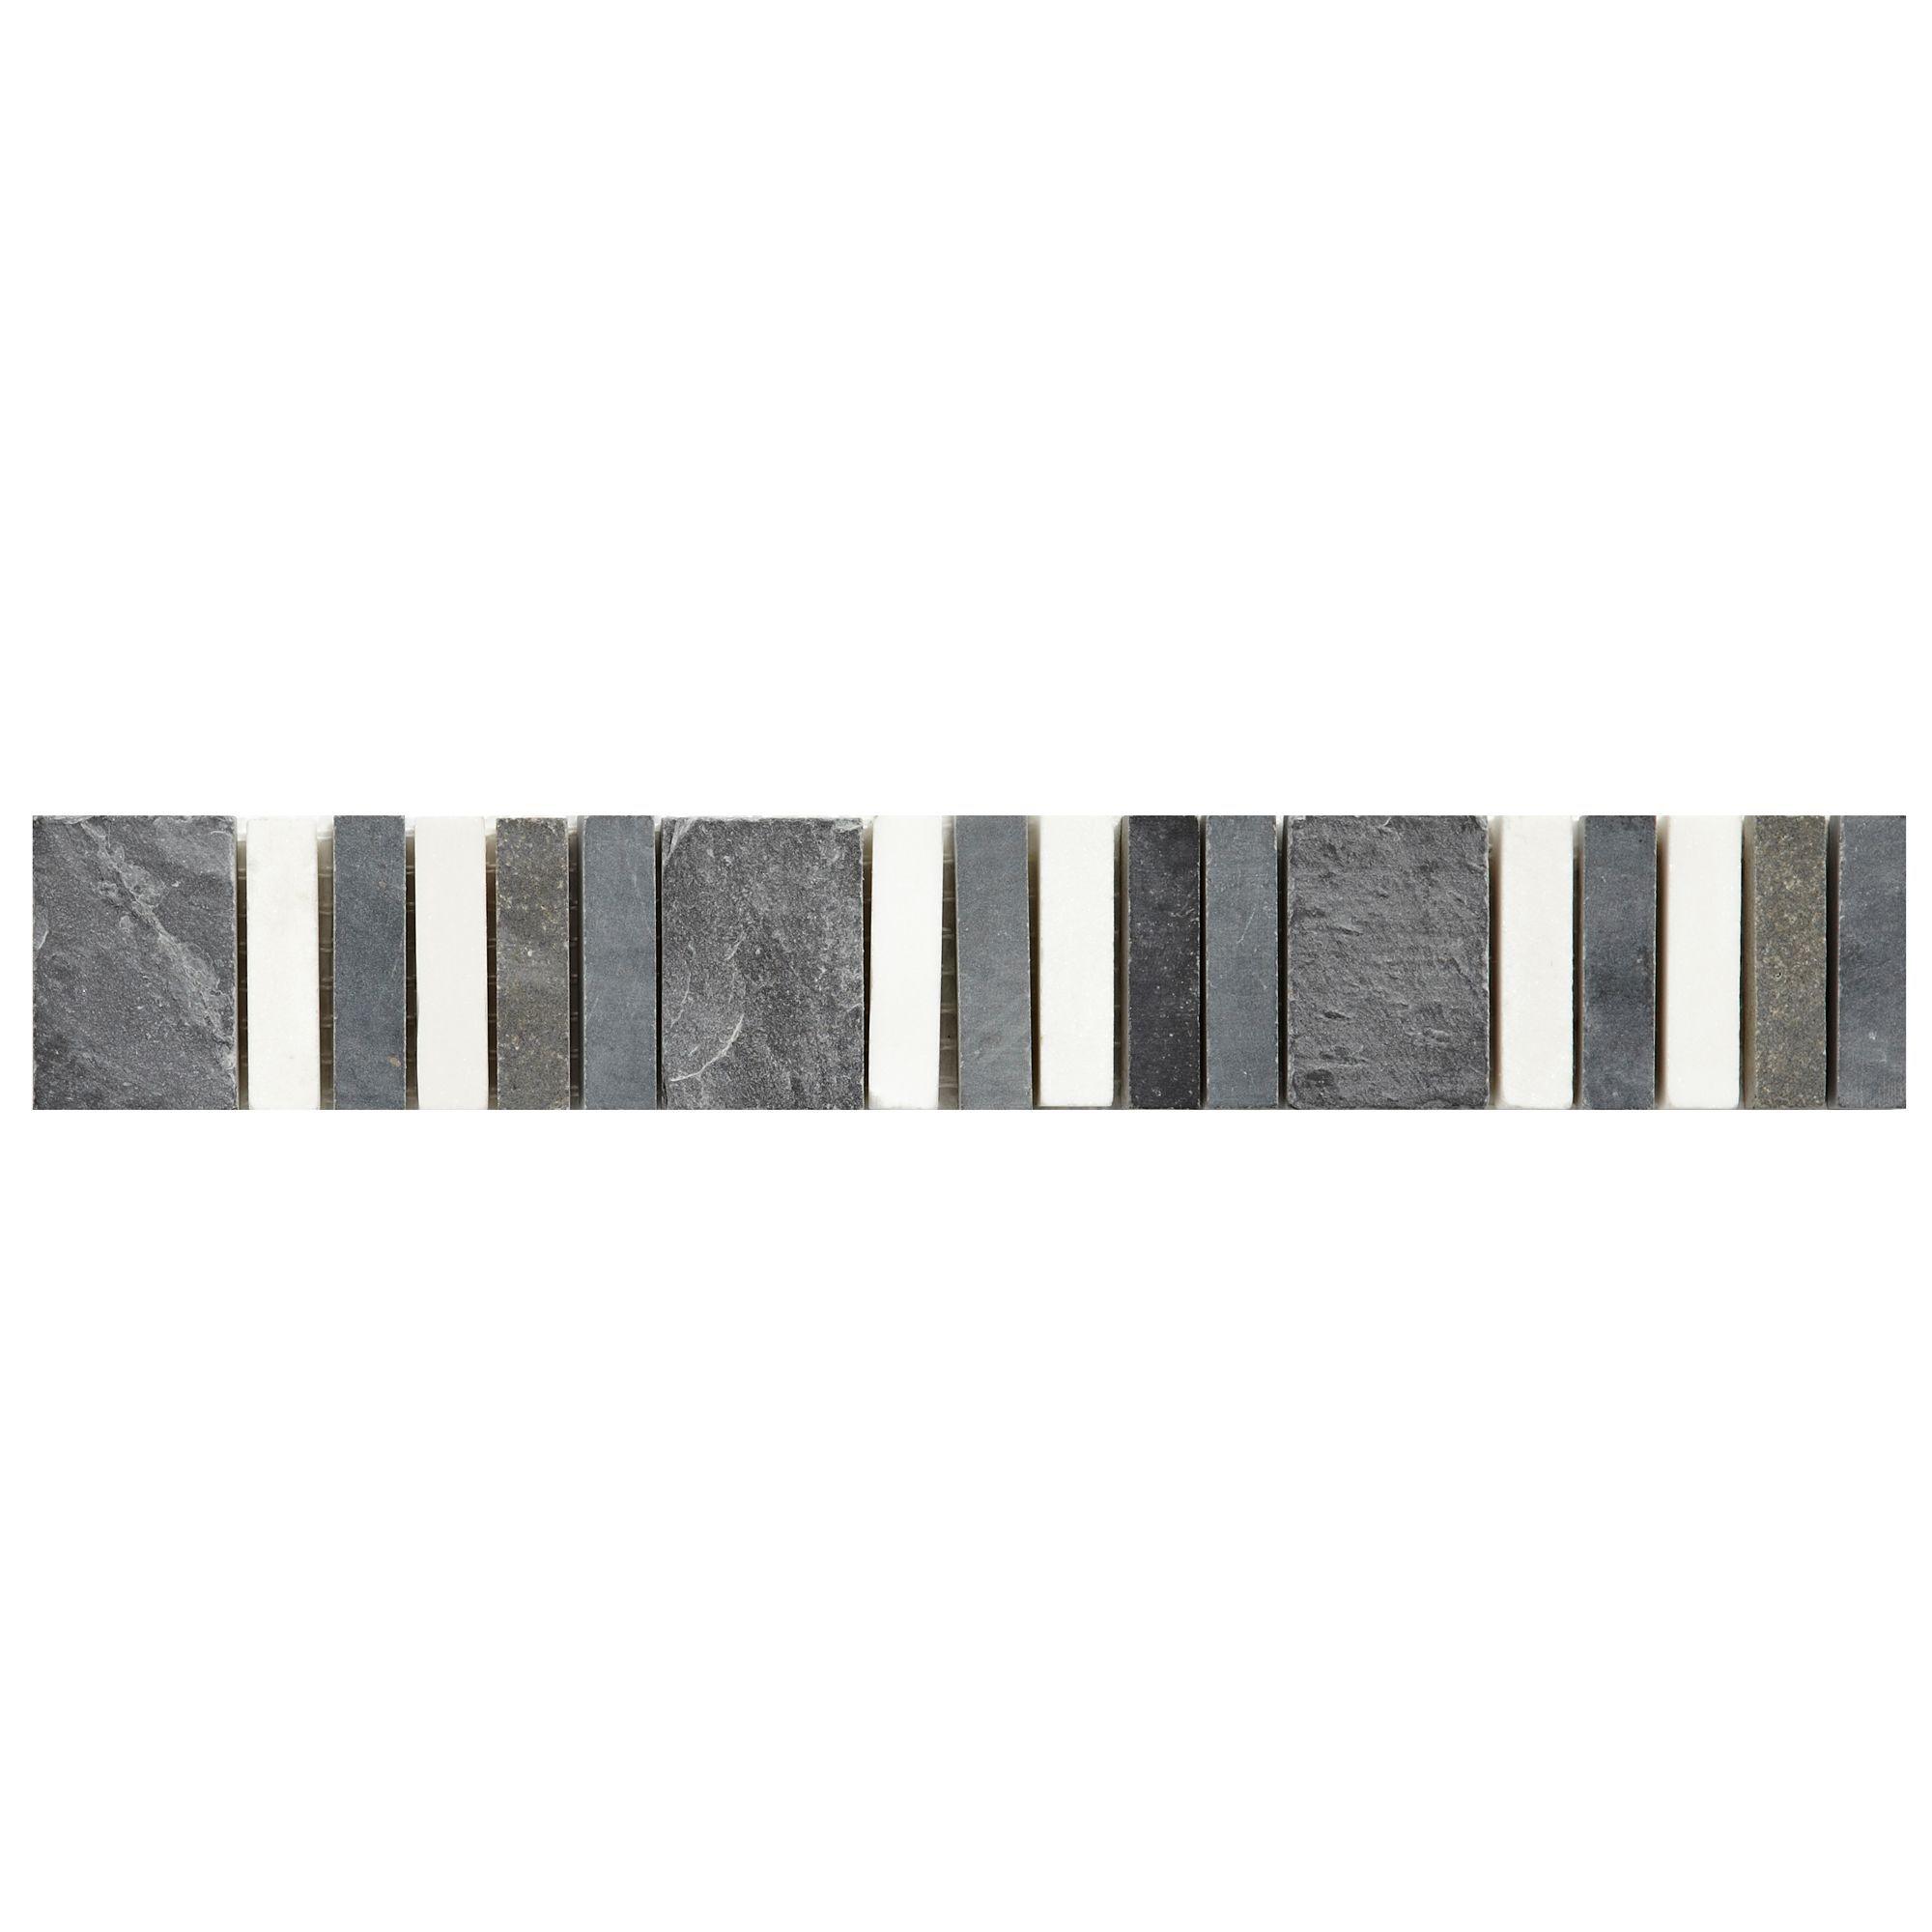 Matchstick Grey Mosaic Border Tile L 250mm W 40mm